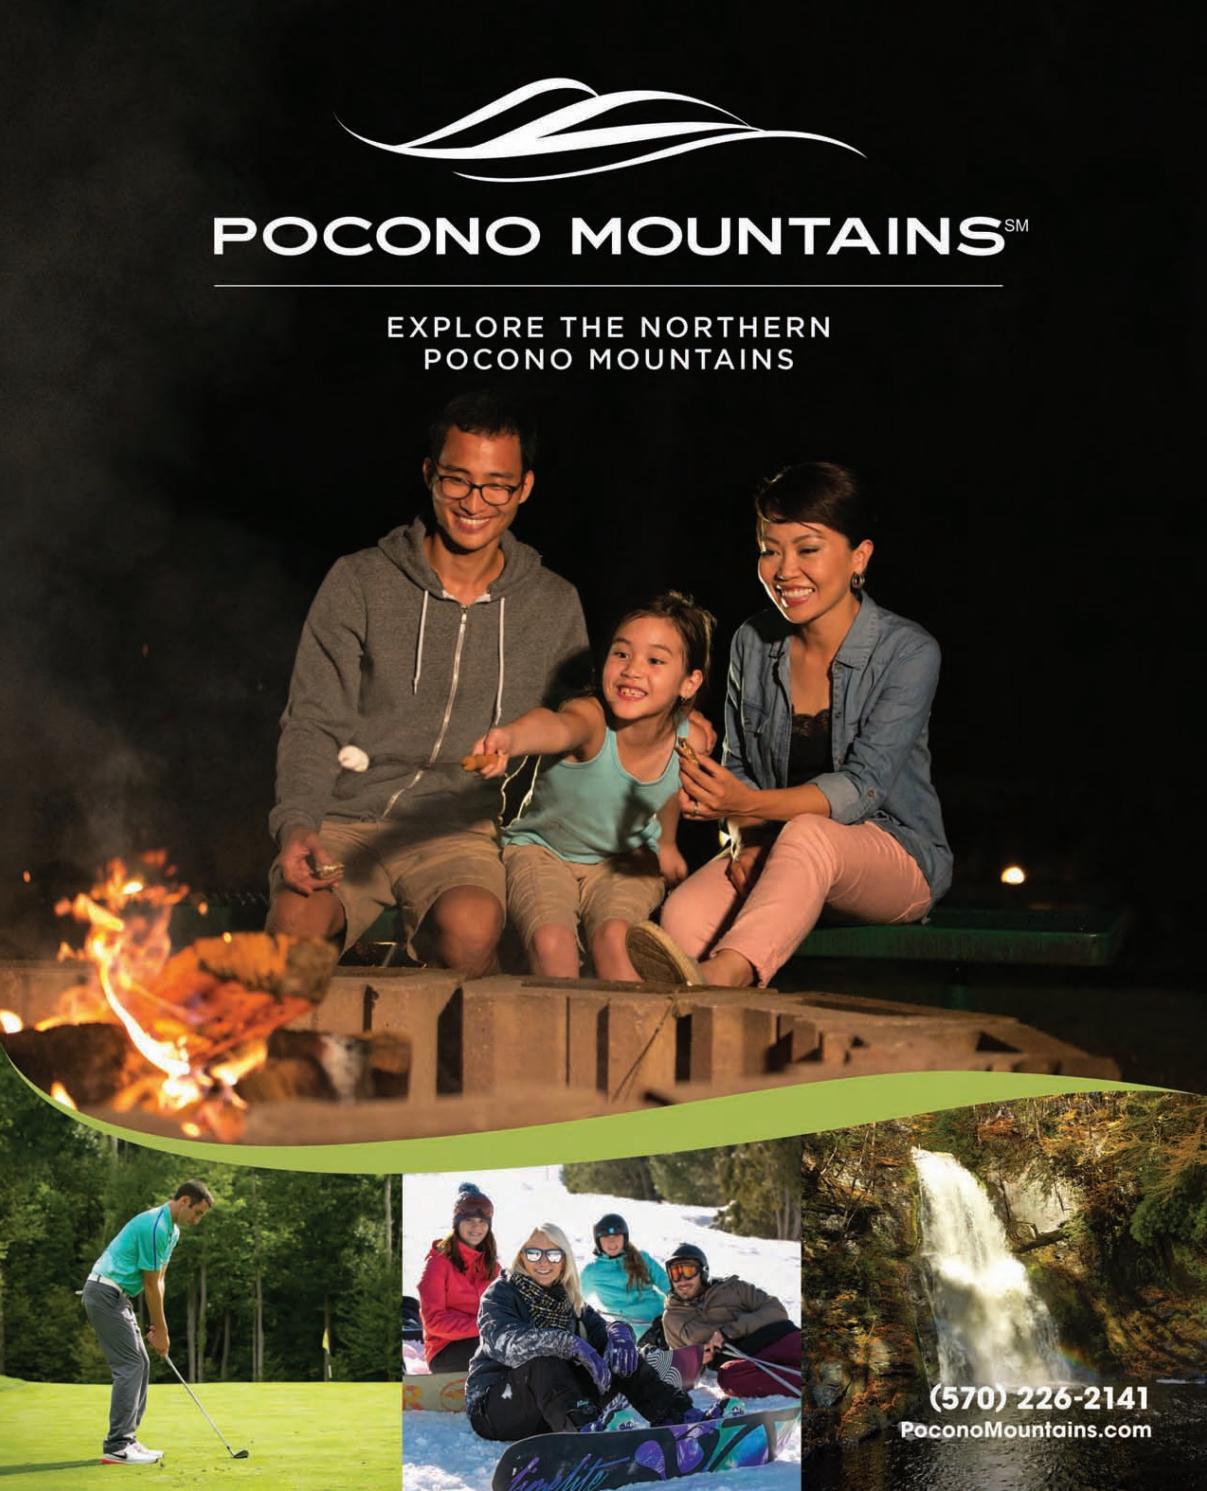 2018 Northern Pocono Mountains Travel Guide By Koas Masker Mr Visitors Bureau Issuu